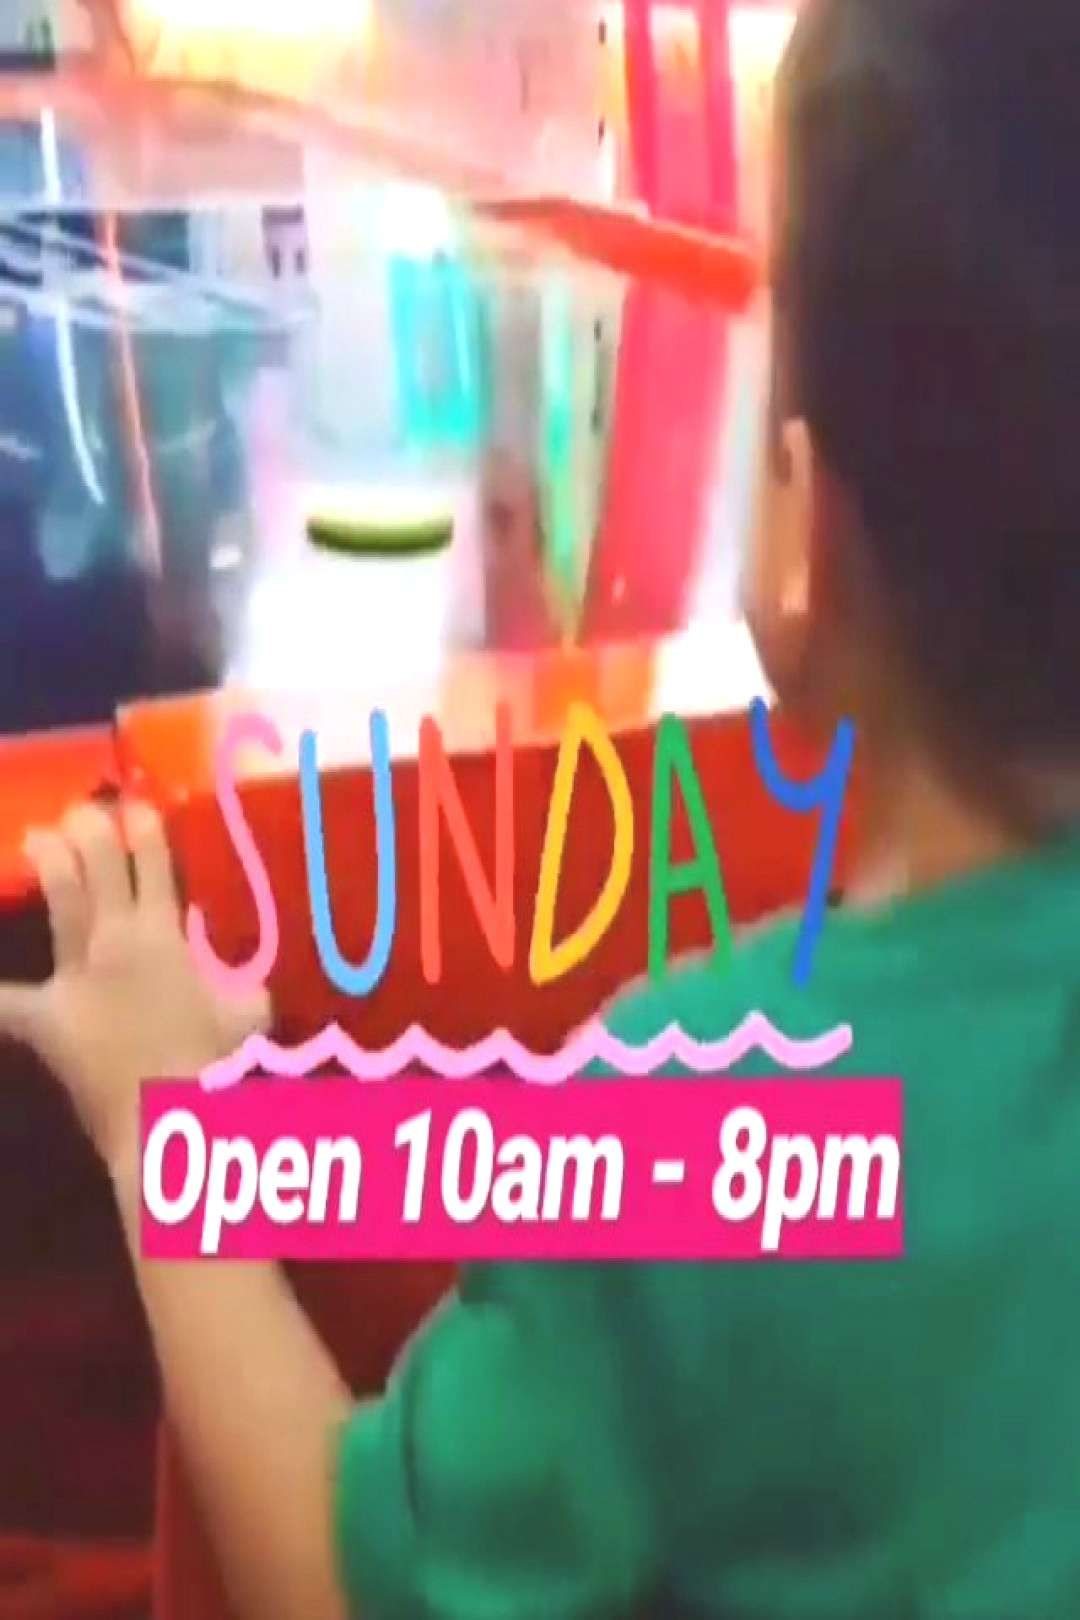 #kidsworld #sunday #funday #world #slide #kids #open #from #10pm #8pm #is #la Sunday funday Kids World is open from 10pm 8pm kidsworld slide laYou can find Kidsworld and more on our website.Sunday funday Kids World is open from 10pm 8pm k...